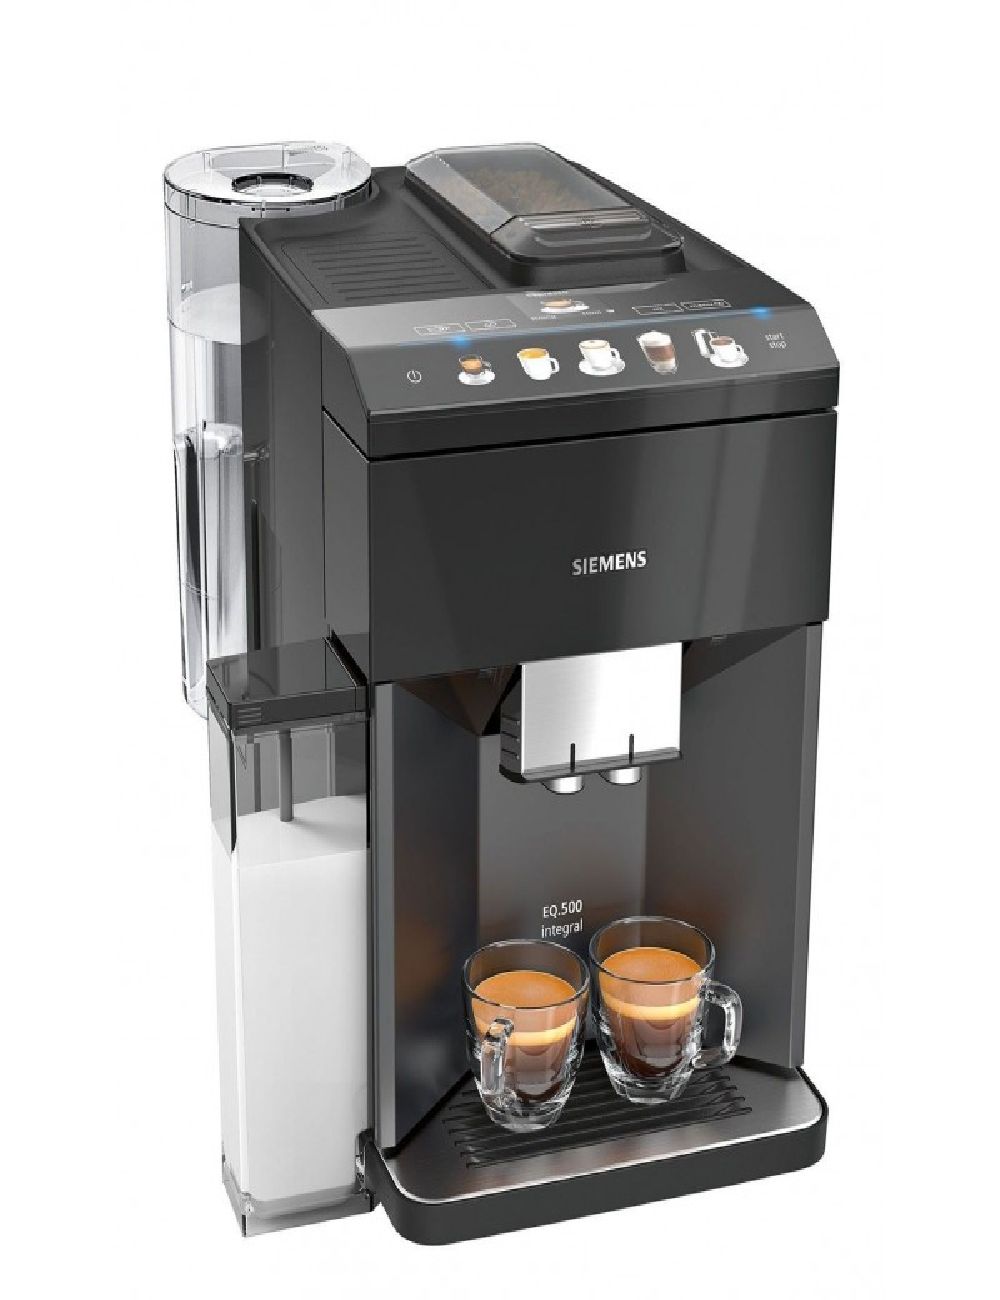 Cafetera Superautomática SIEMENS TQ505R09 1500W